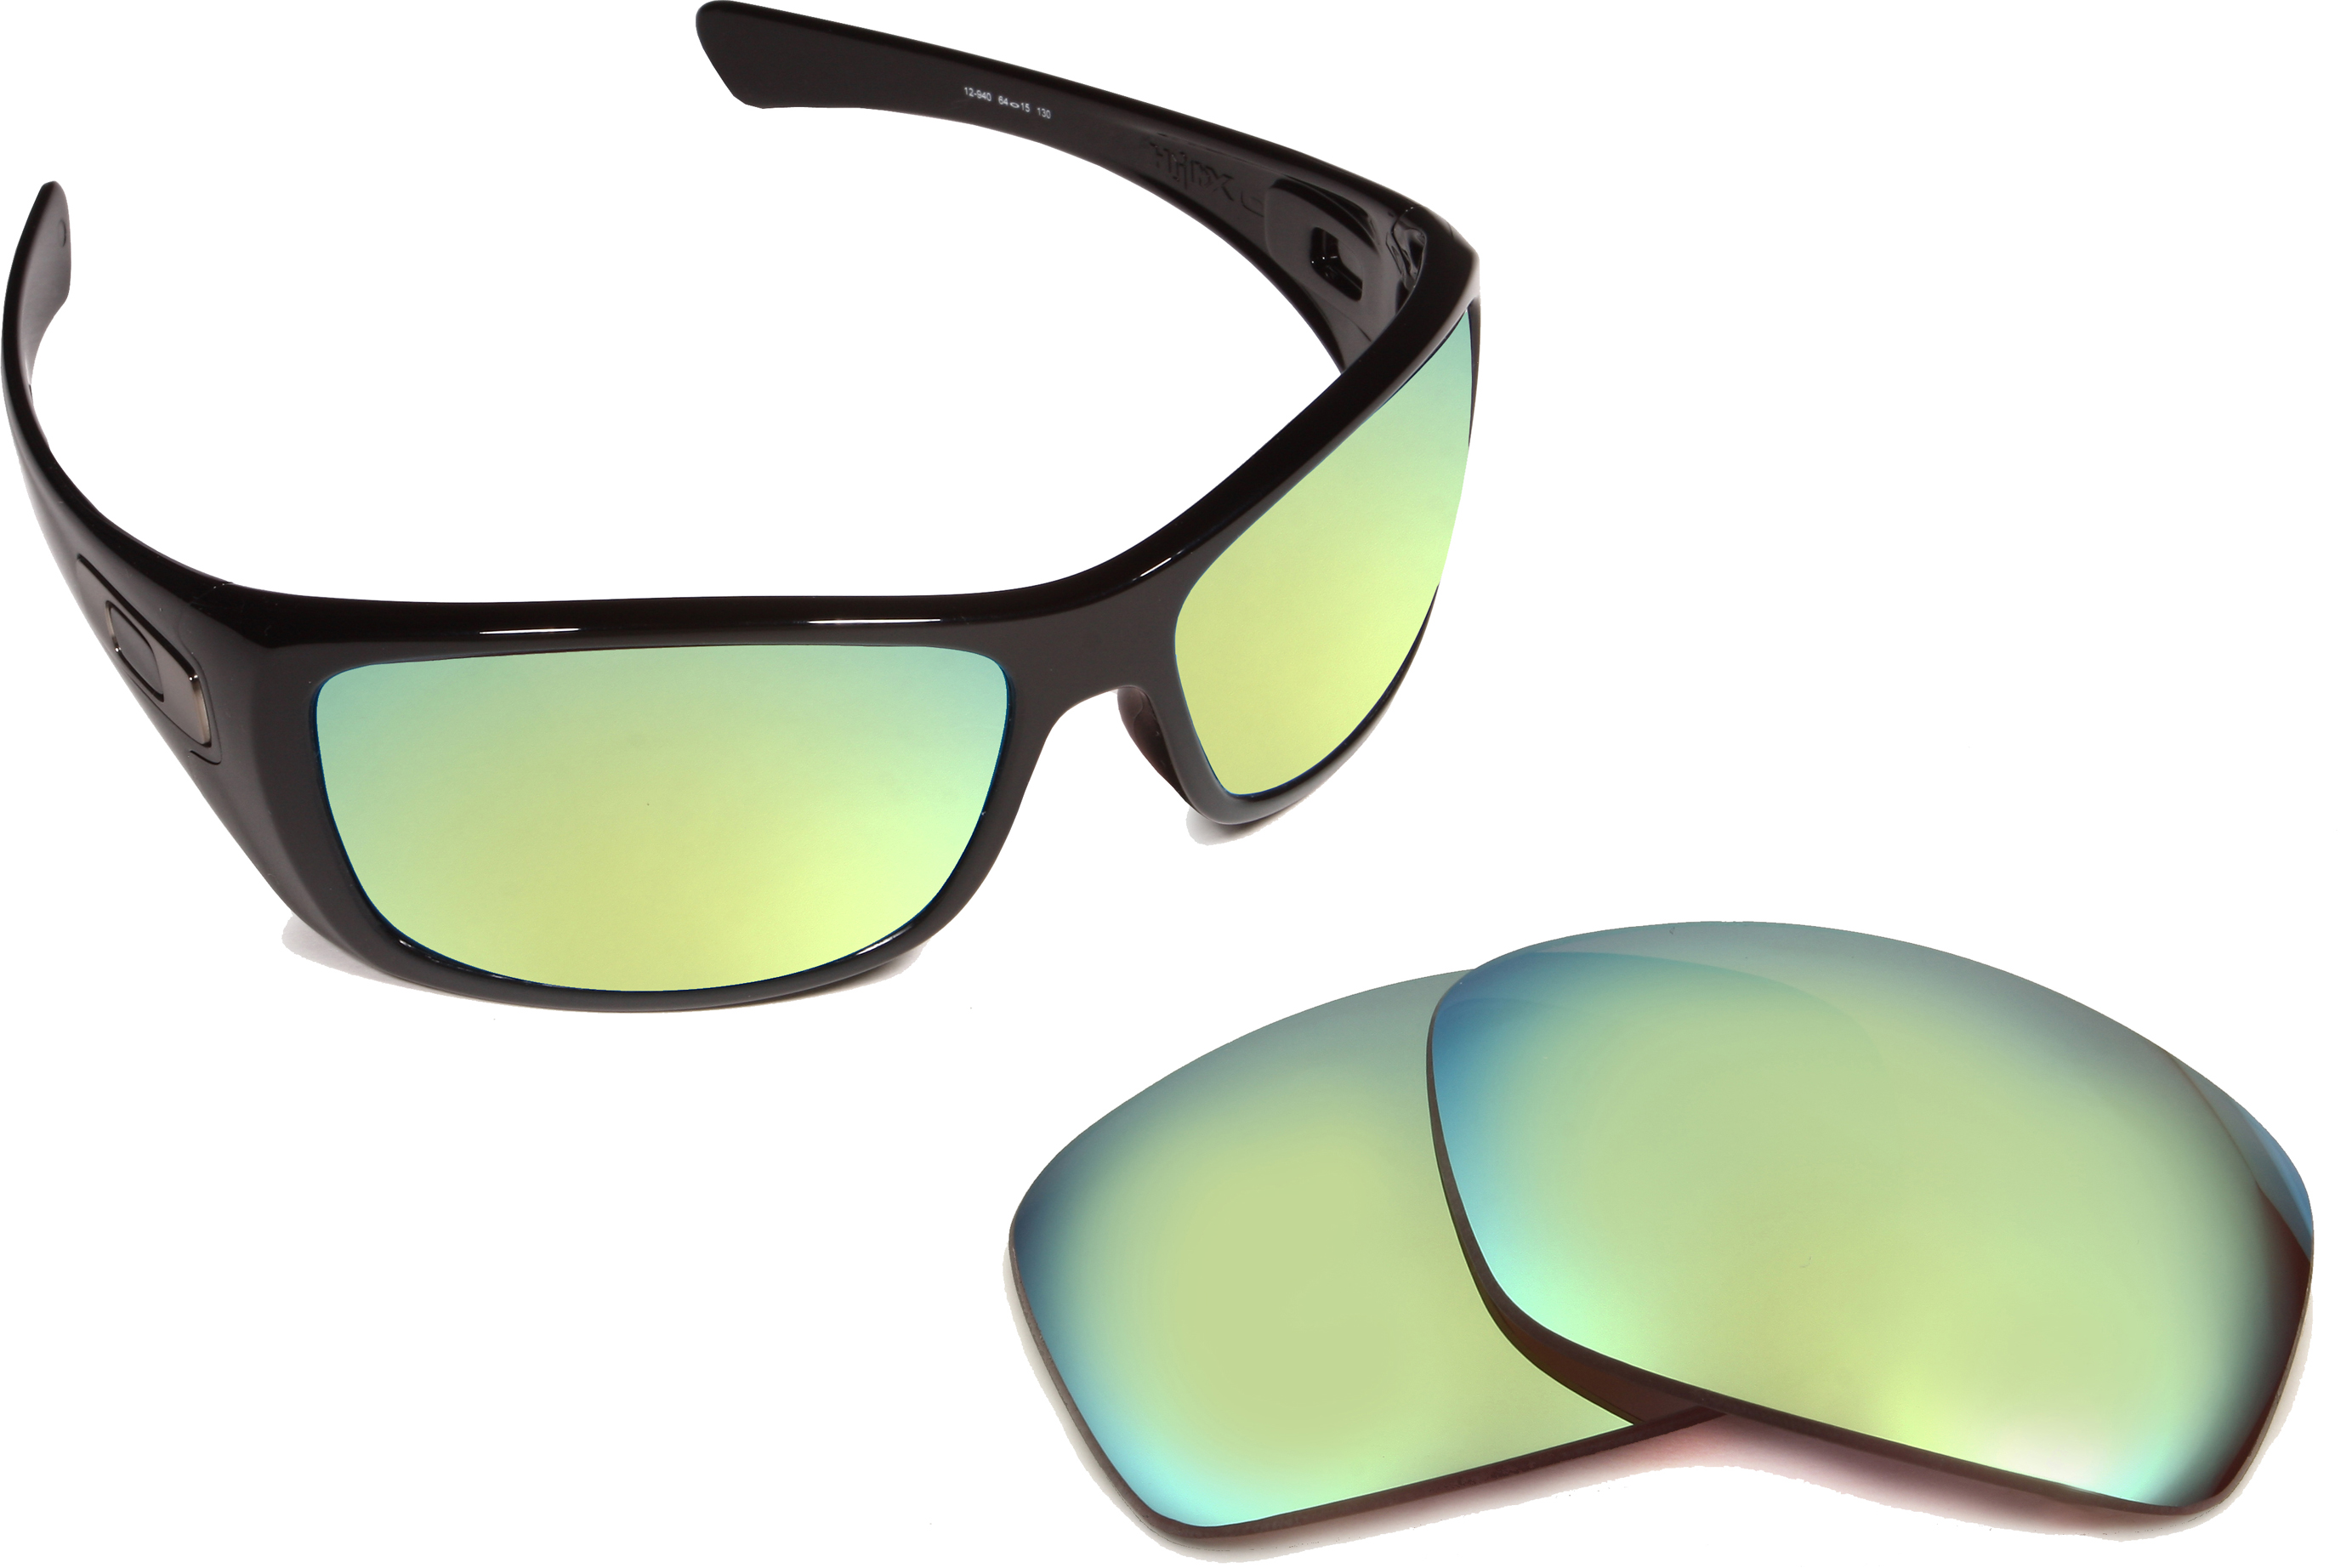 f156d89c34 Oakley Hijinx Green Black Splatter